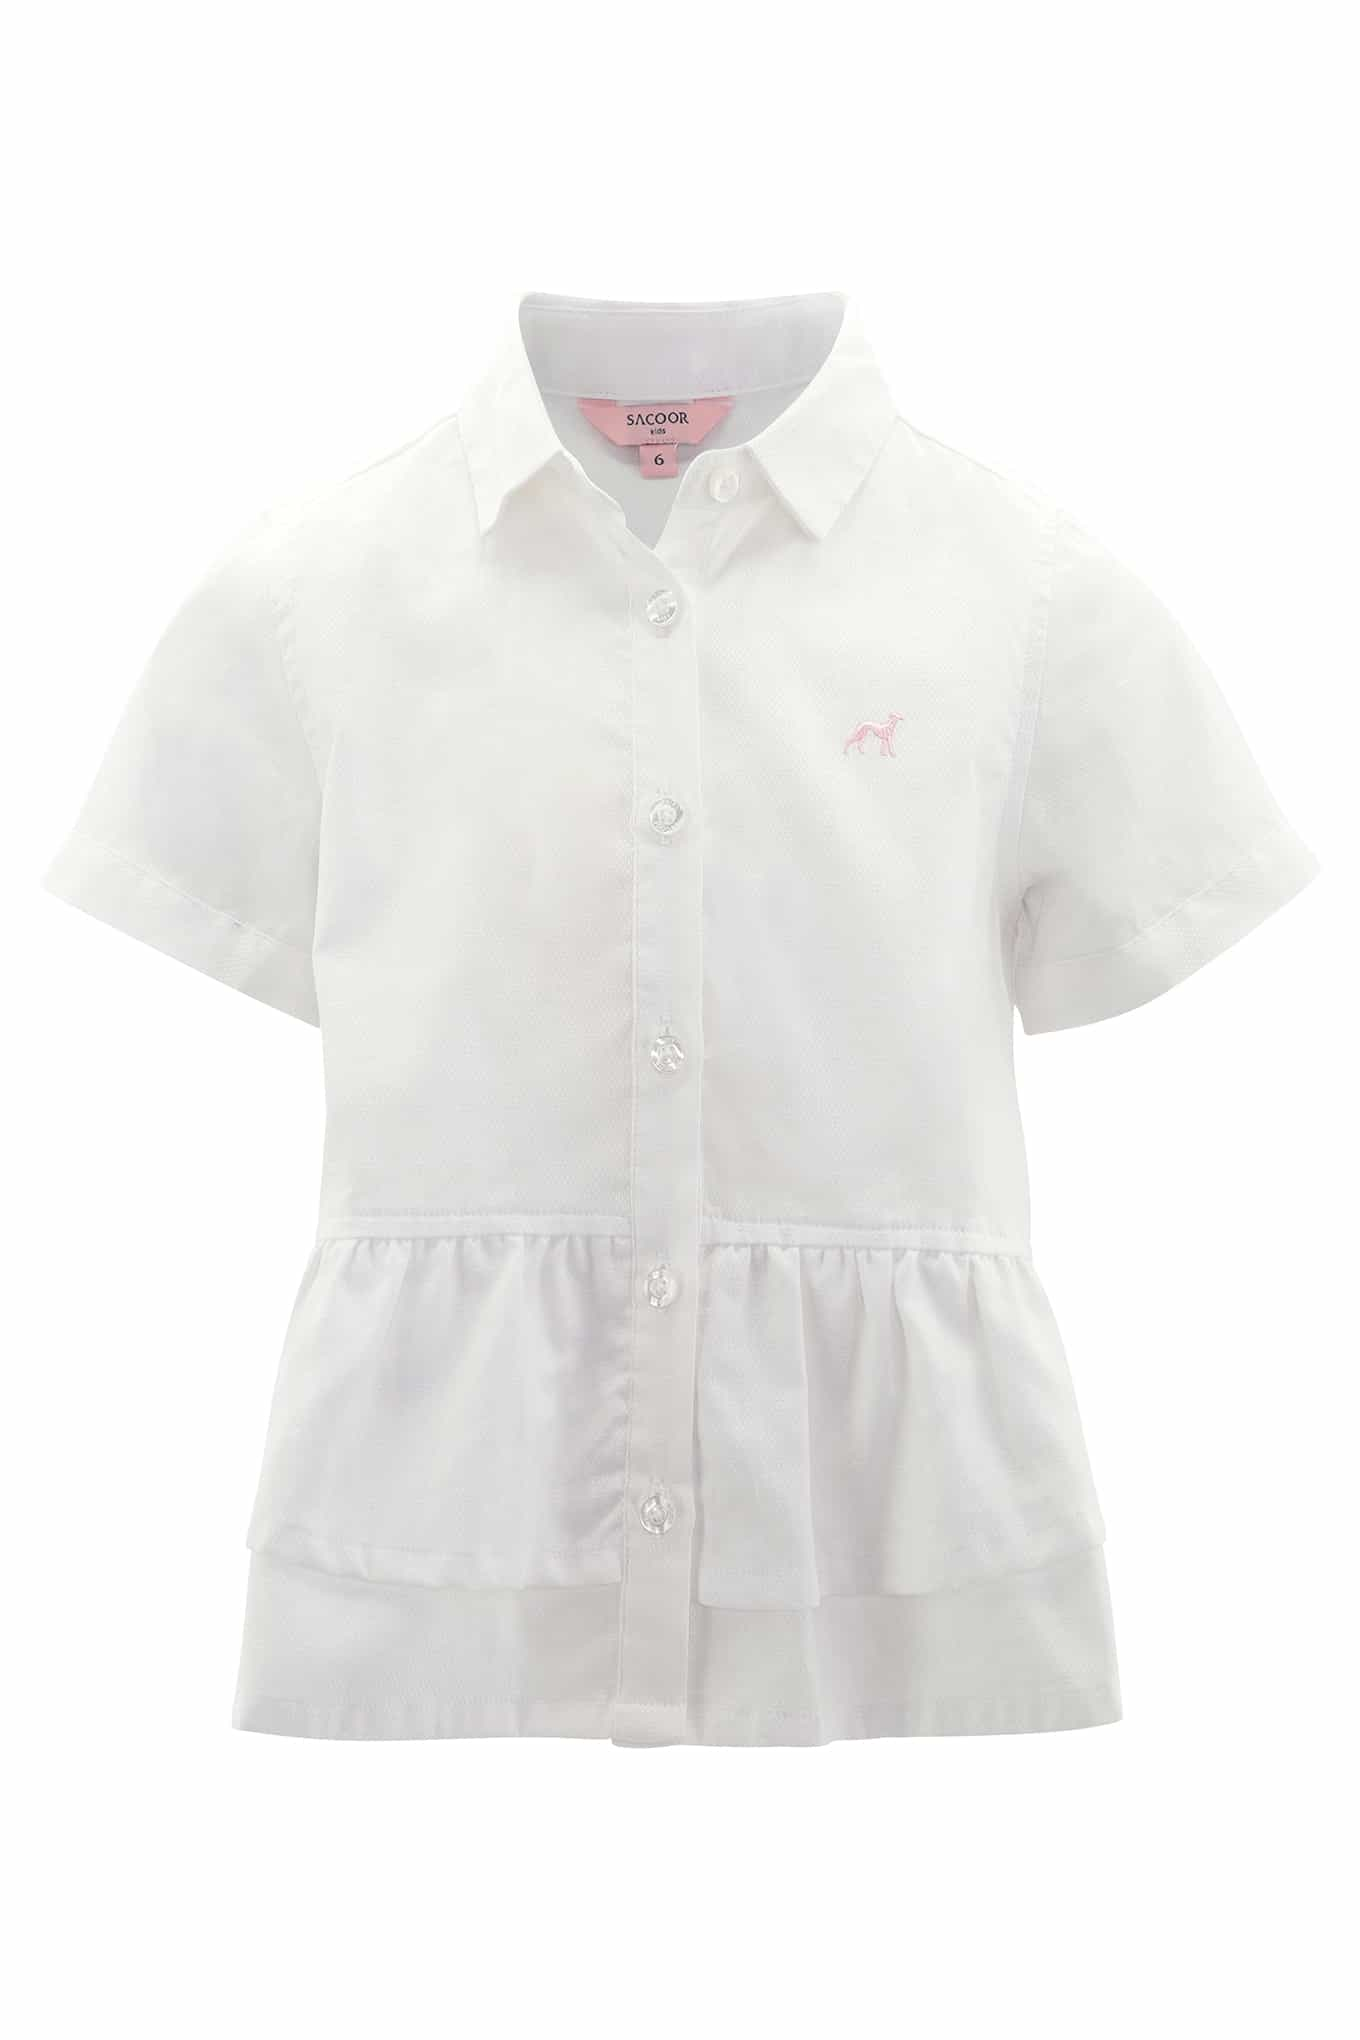 Shirt White Casual Girl